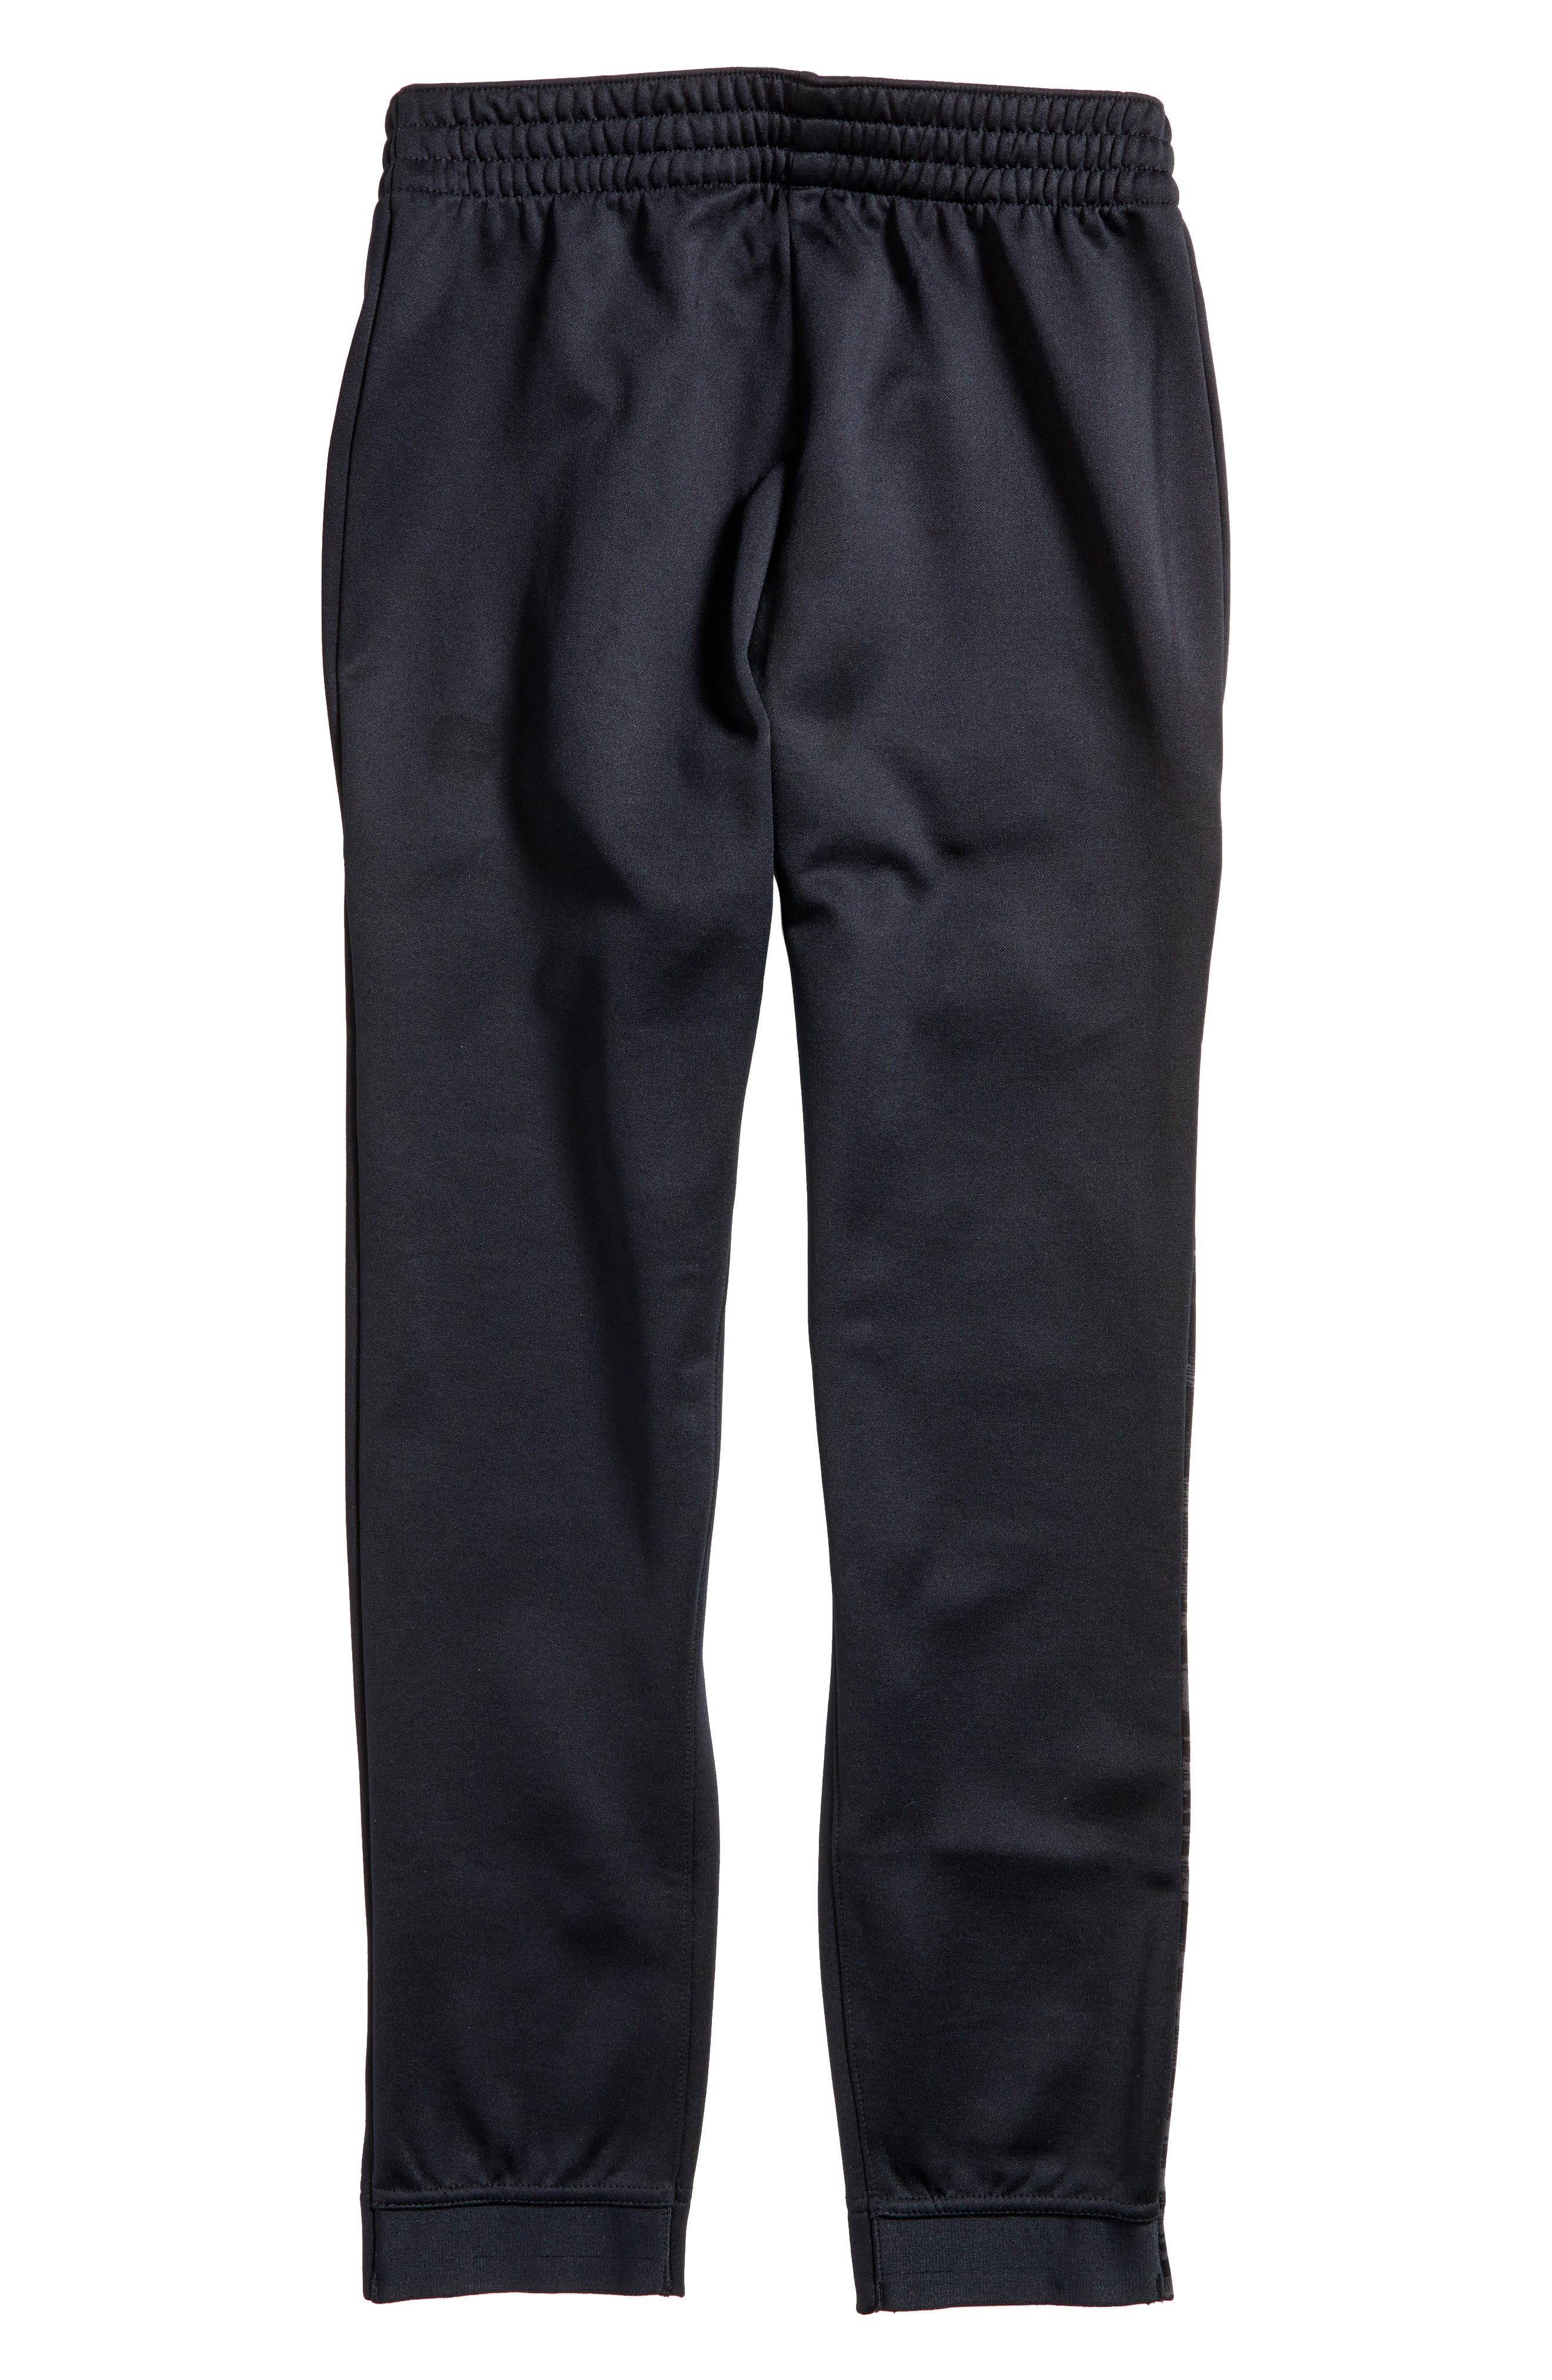 Therma Elite Pants,                         Main,                         color,